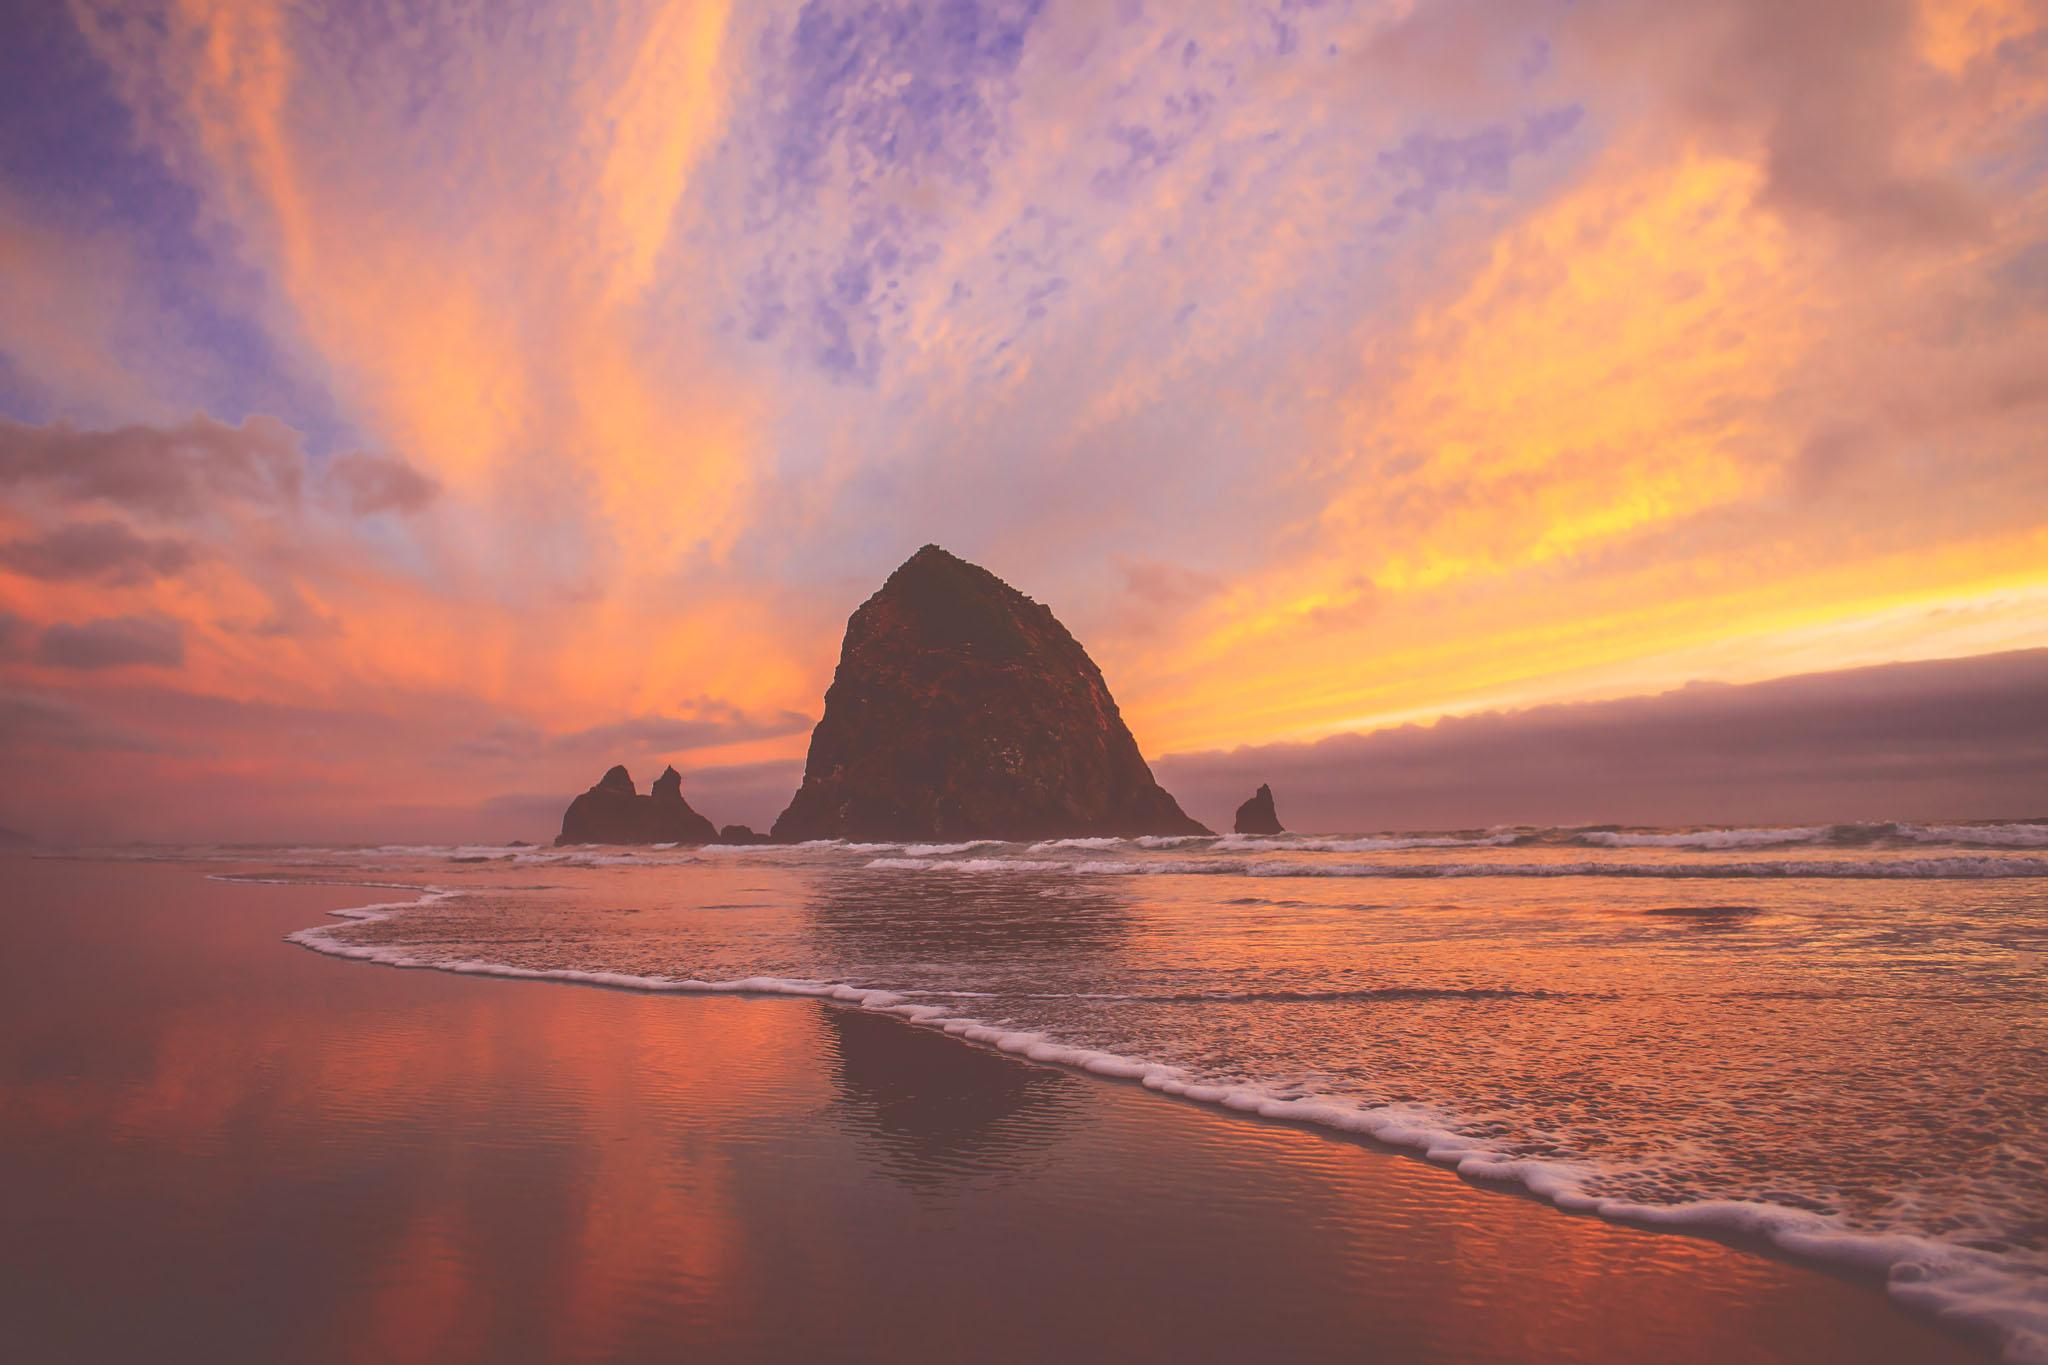 oregon coast, travel photographer, jennifer picard photography